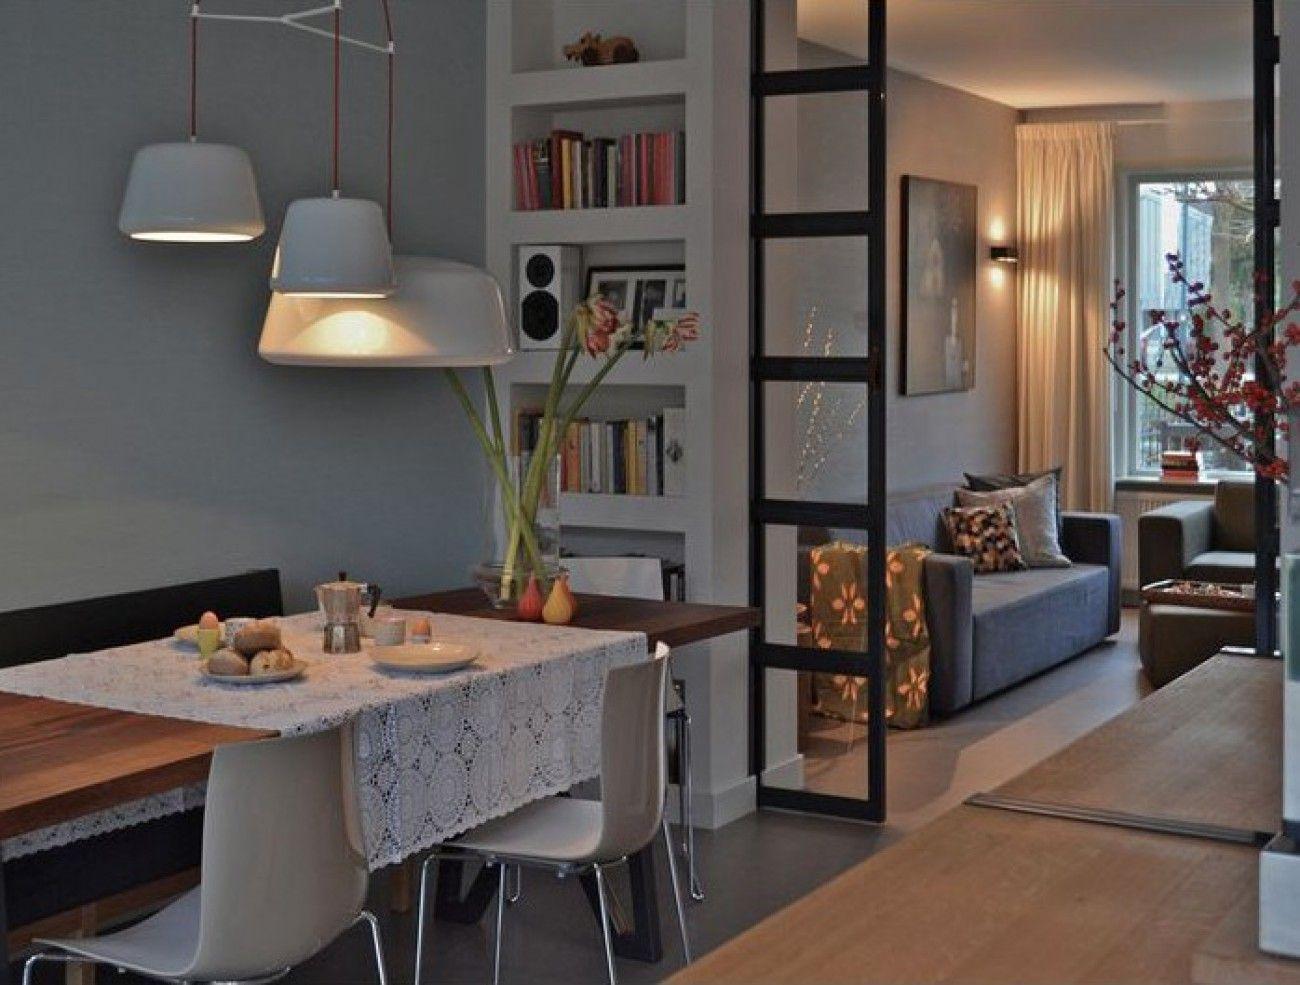 Moderne Traditionele Woonkamer : Moderne woonkamer keuken en eetkamer stock illustratie